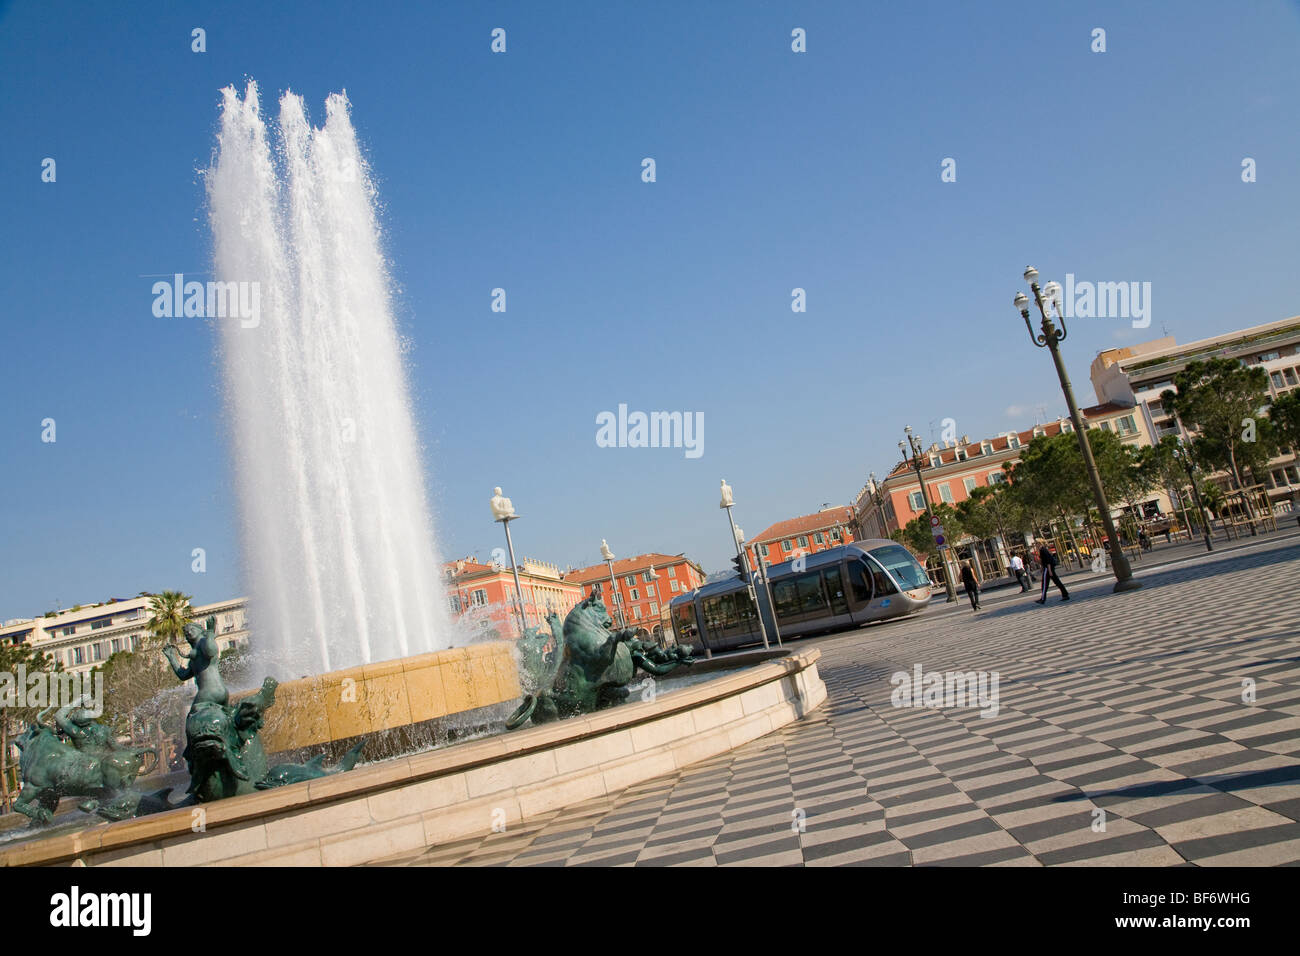 Place Massena, Streetcar T1, Nice, Cote D Azur, Provence, France - Stock Image